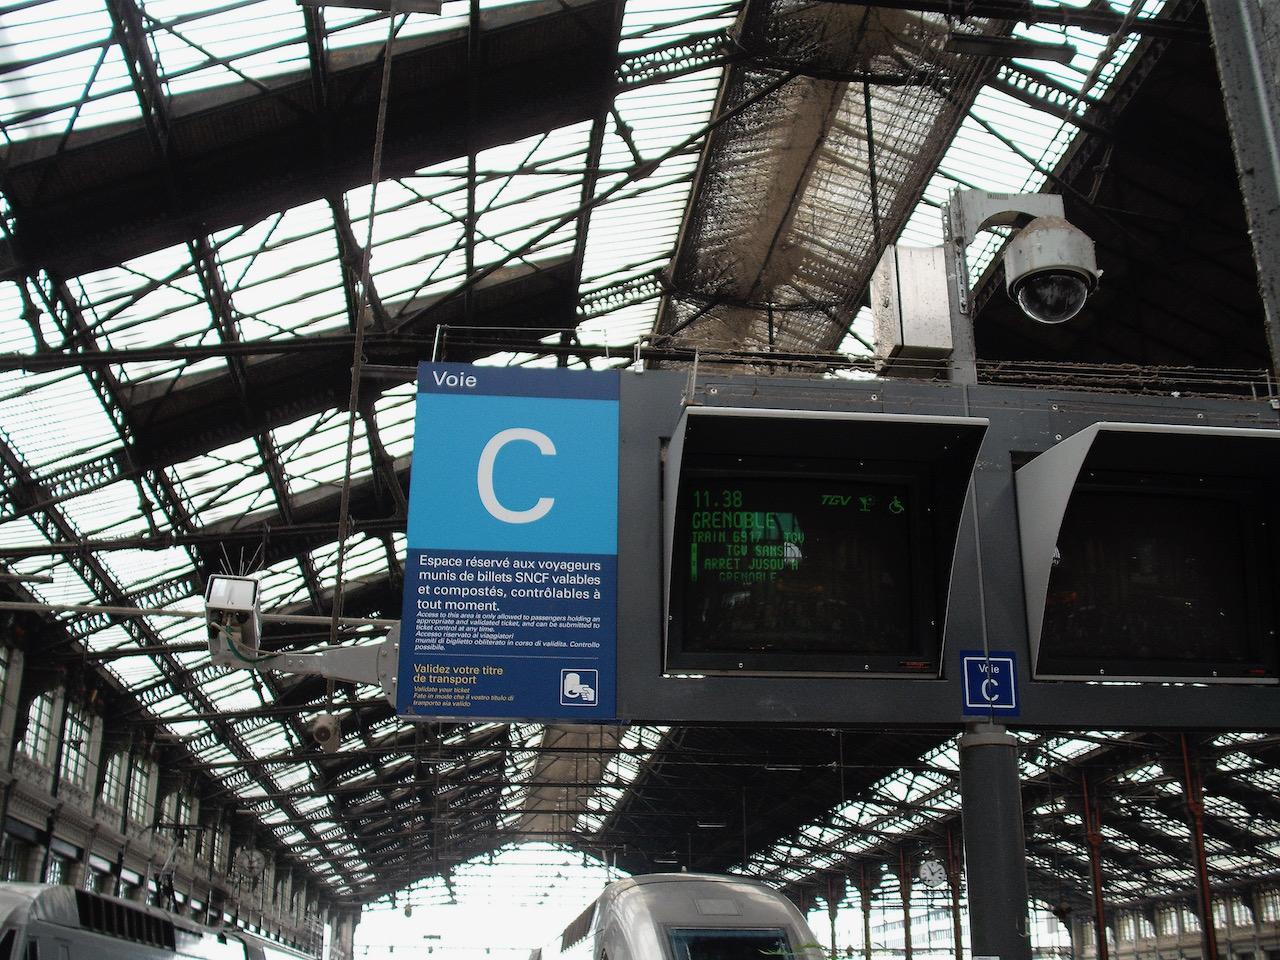 Information screen for TGV 6917